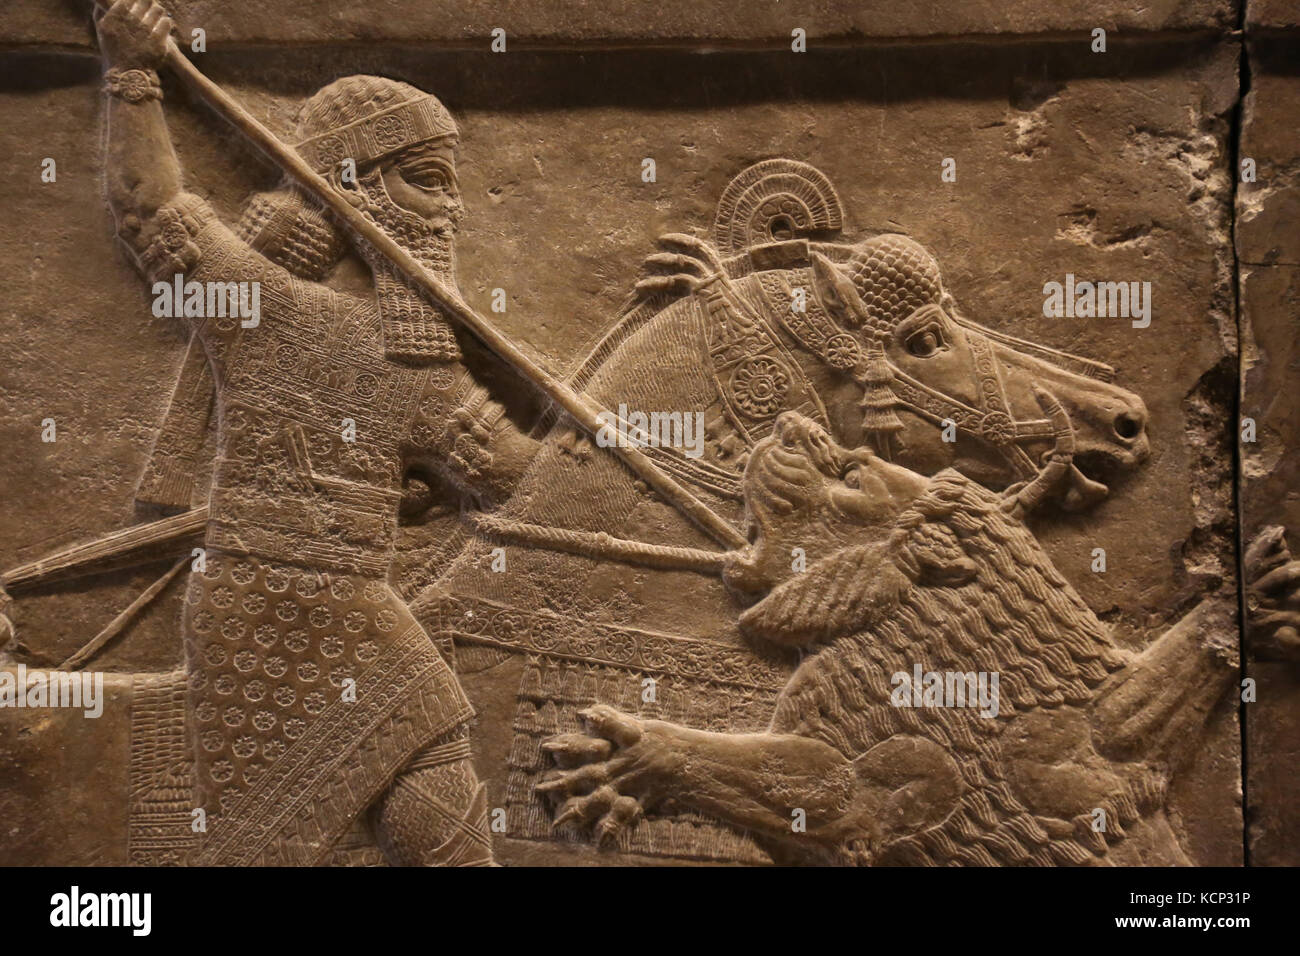 Assurbanipal Jagd Löwe. Erleichterung. neo-Assyrer. Palace, Ninive, Irak. 645-635 Bc. british museum london. Stockbild